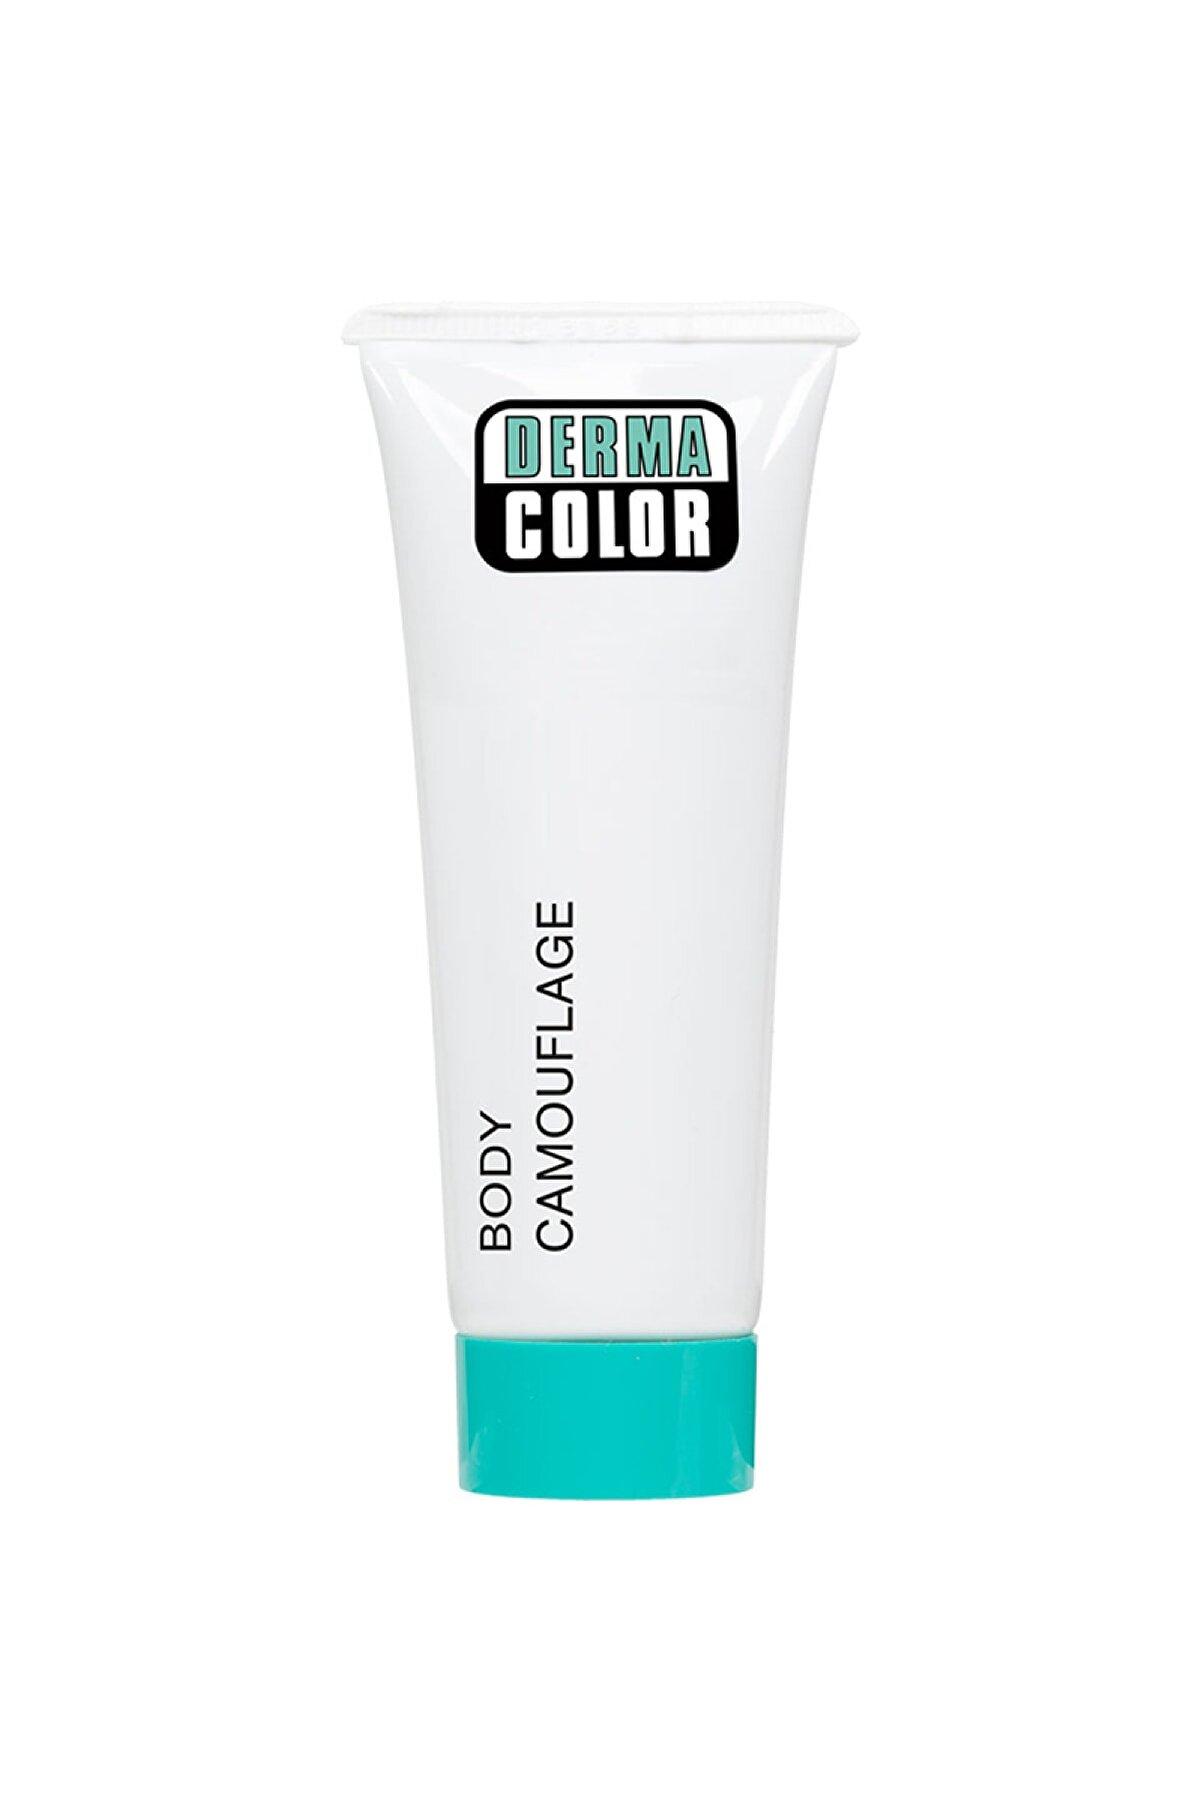 Kryolan Dermacolor® Vücut Kapatıcısı Body Camouflage 50 ml 71121 D7